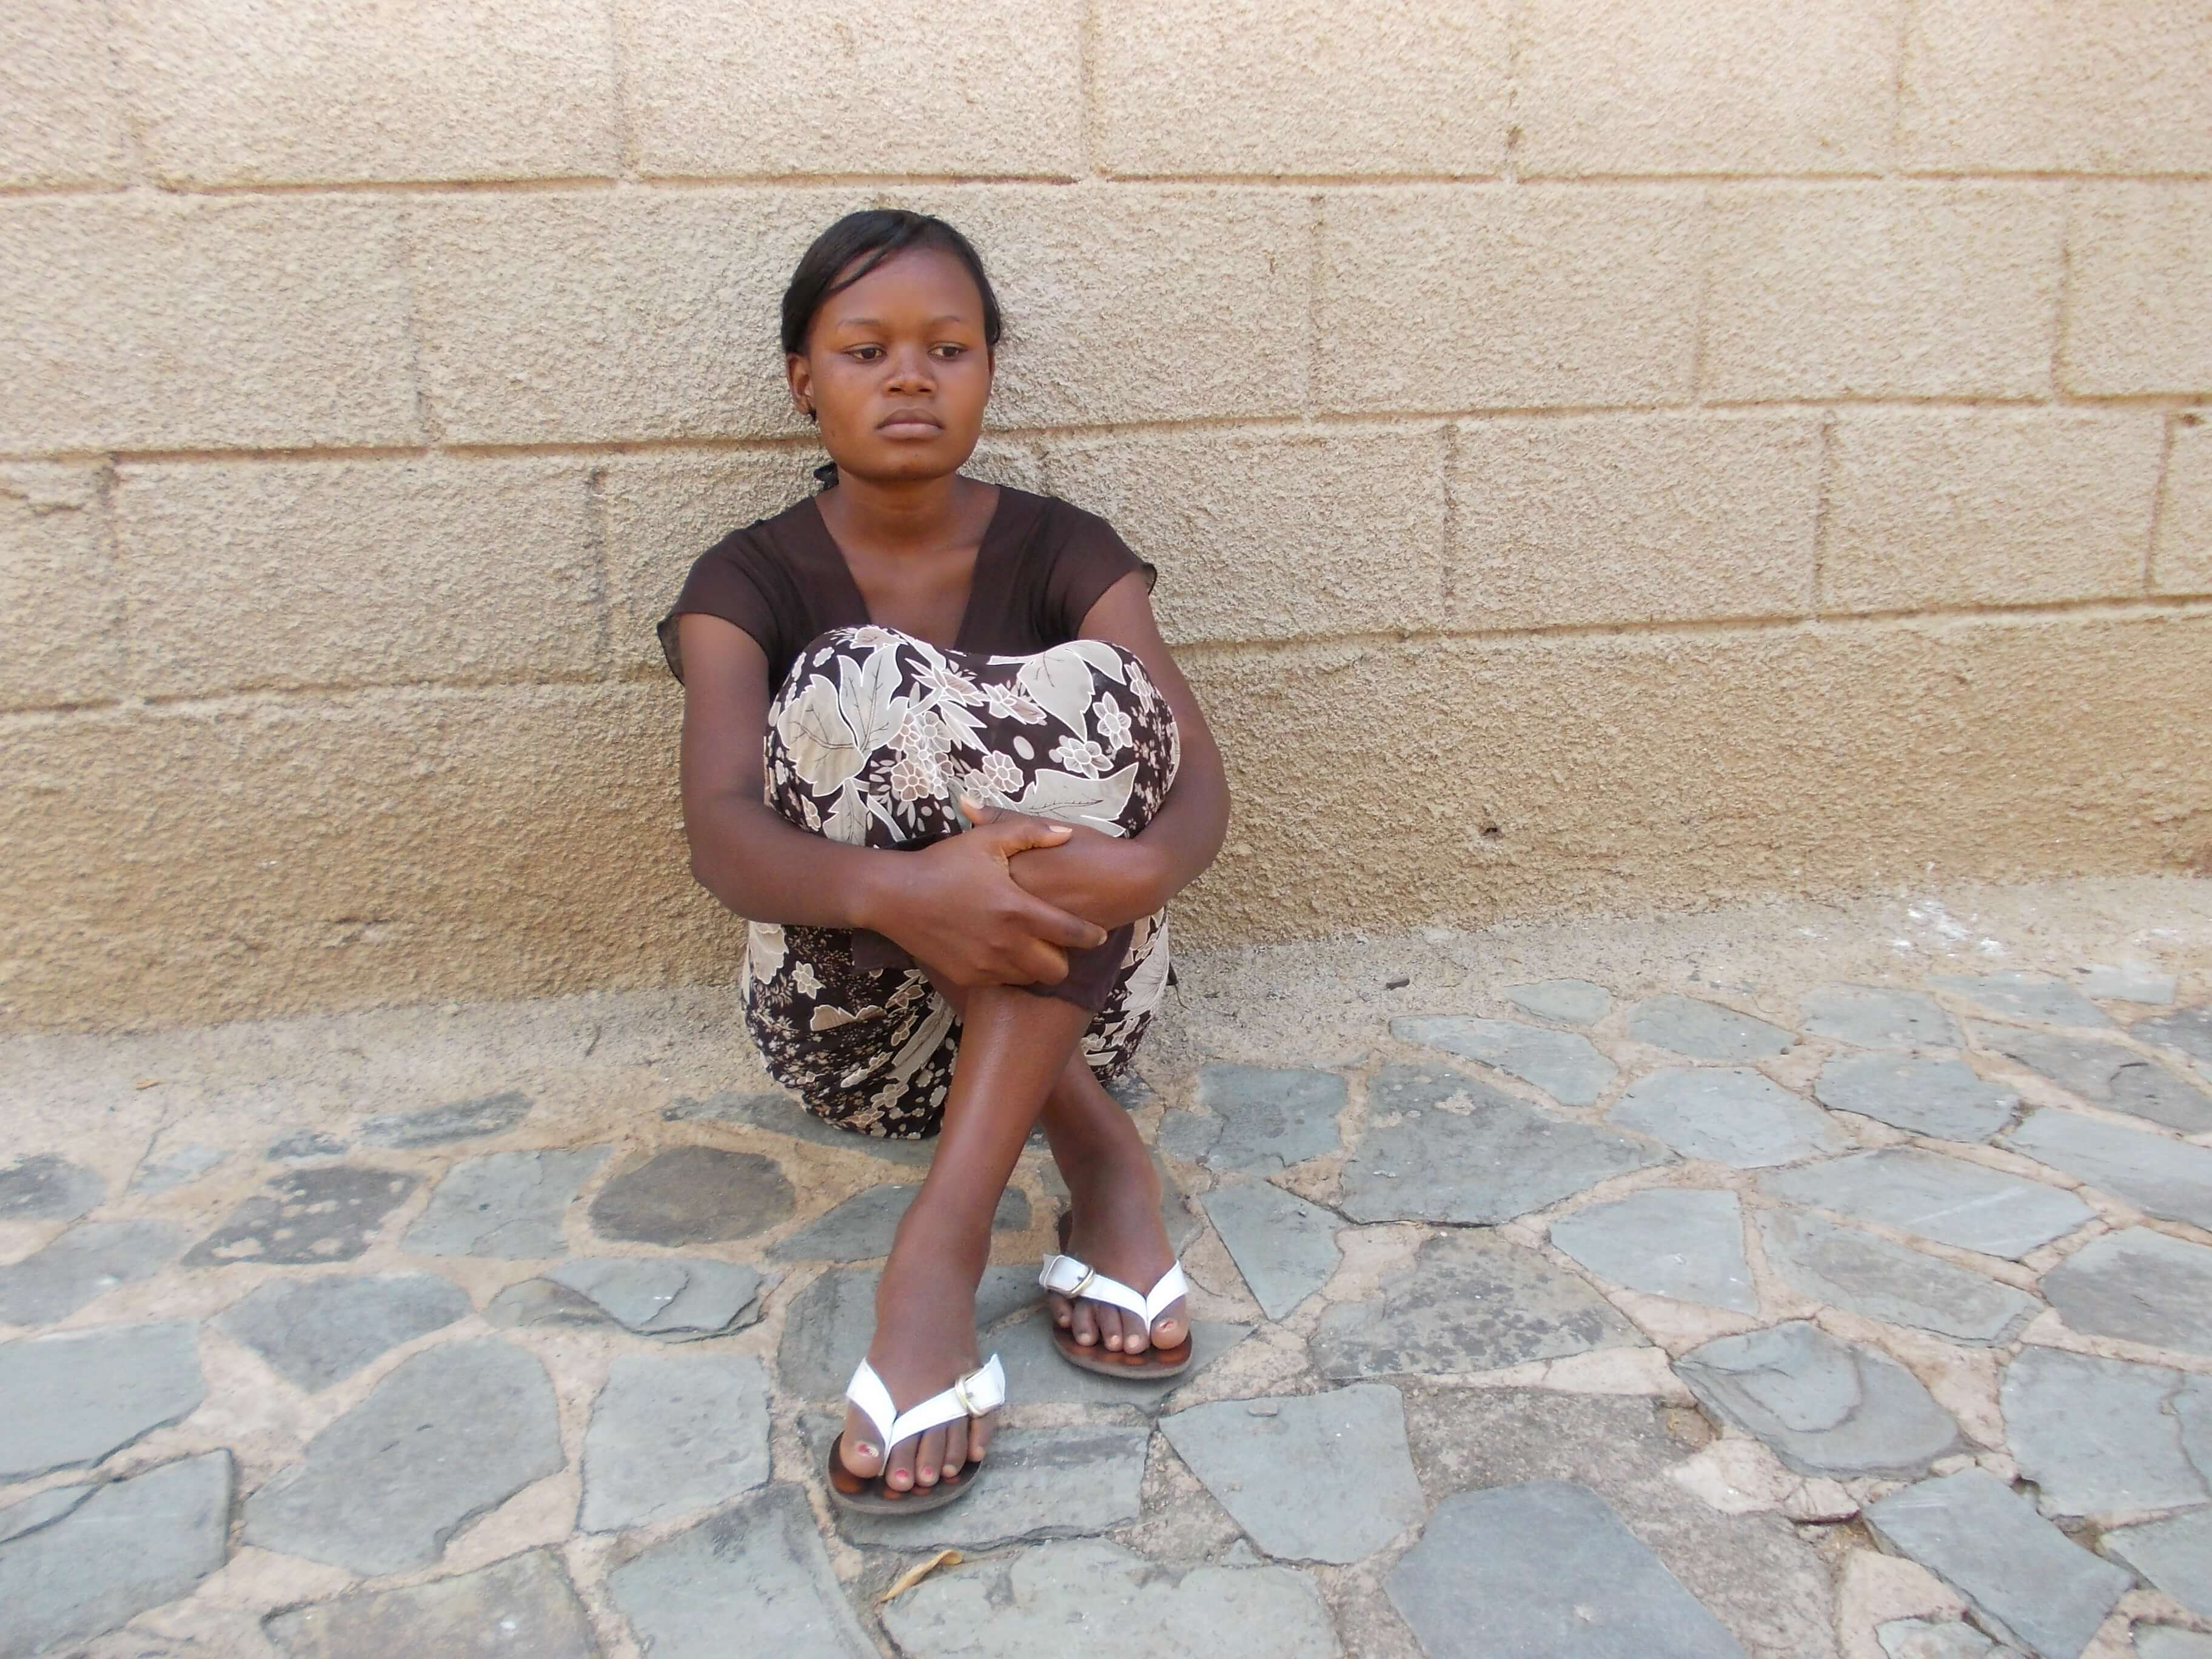 Tanzania: Women's Bank in Pipeline